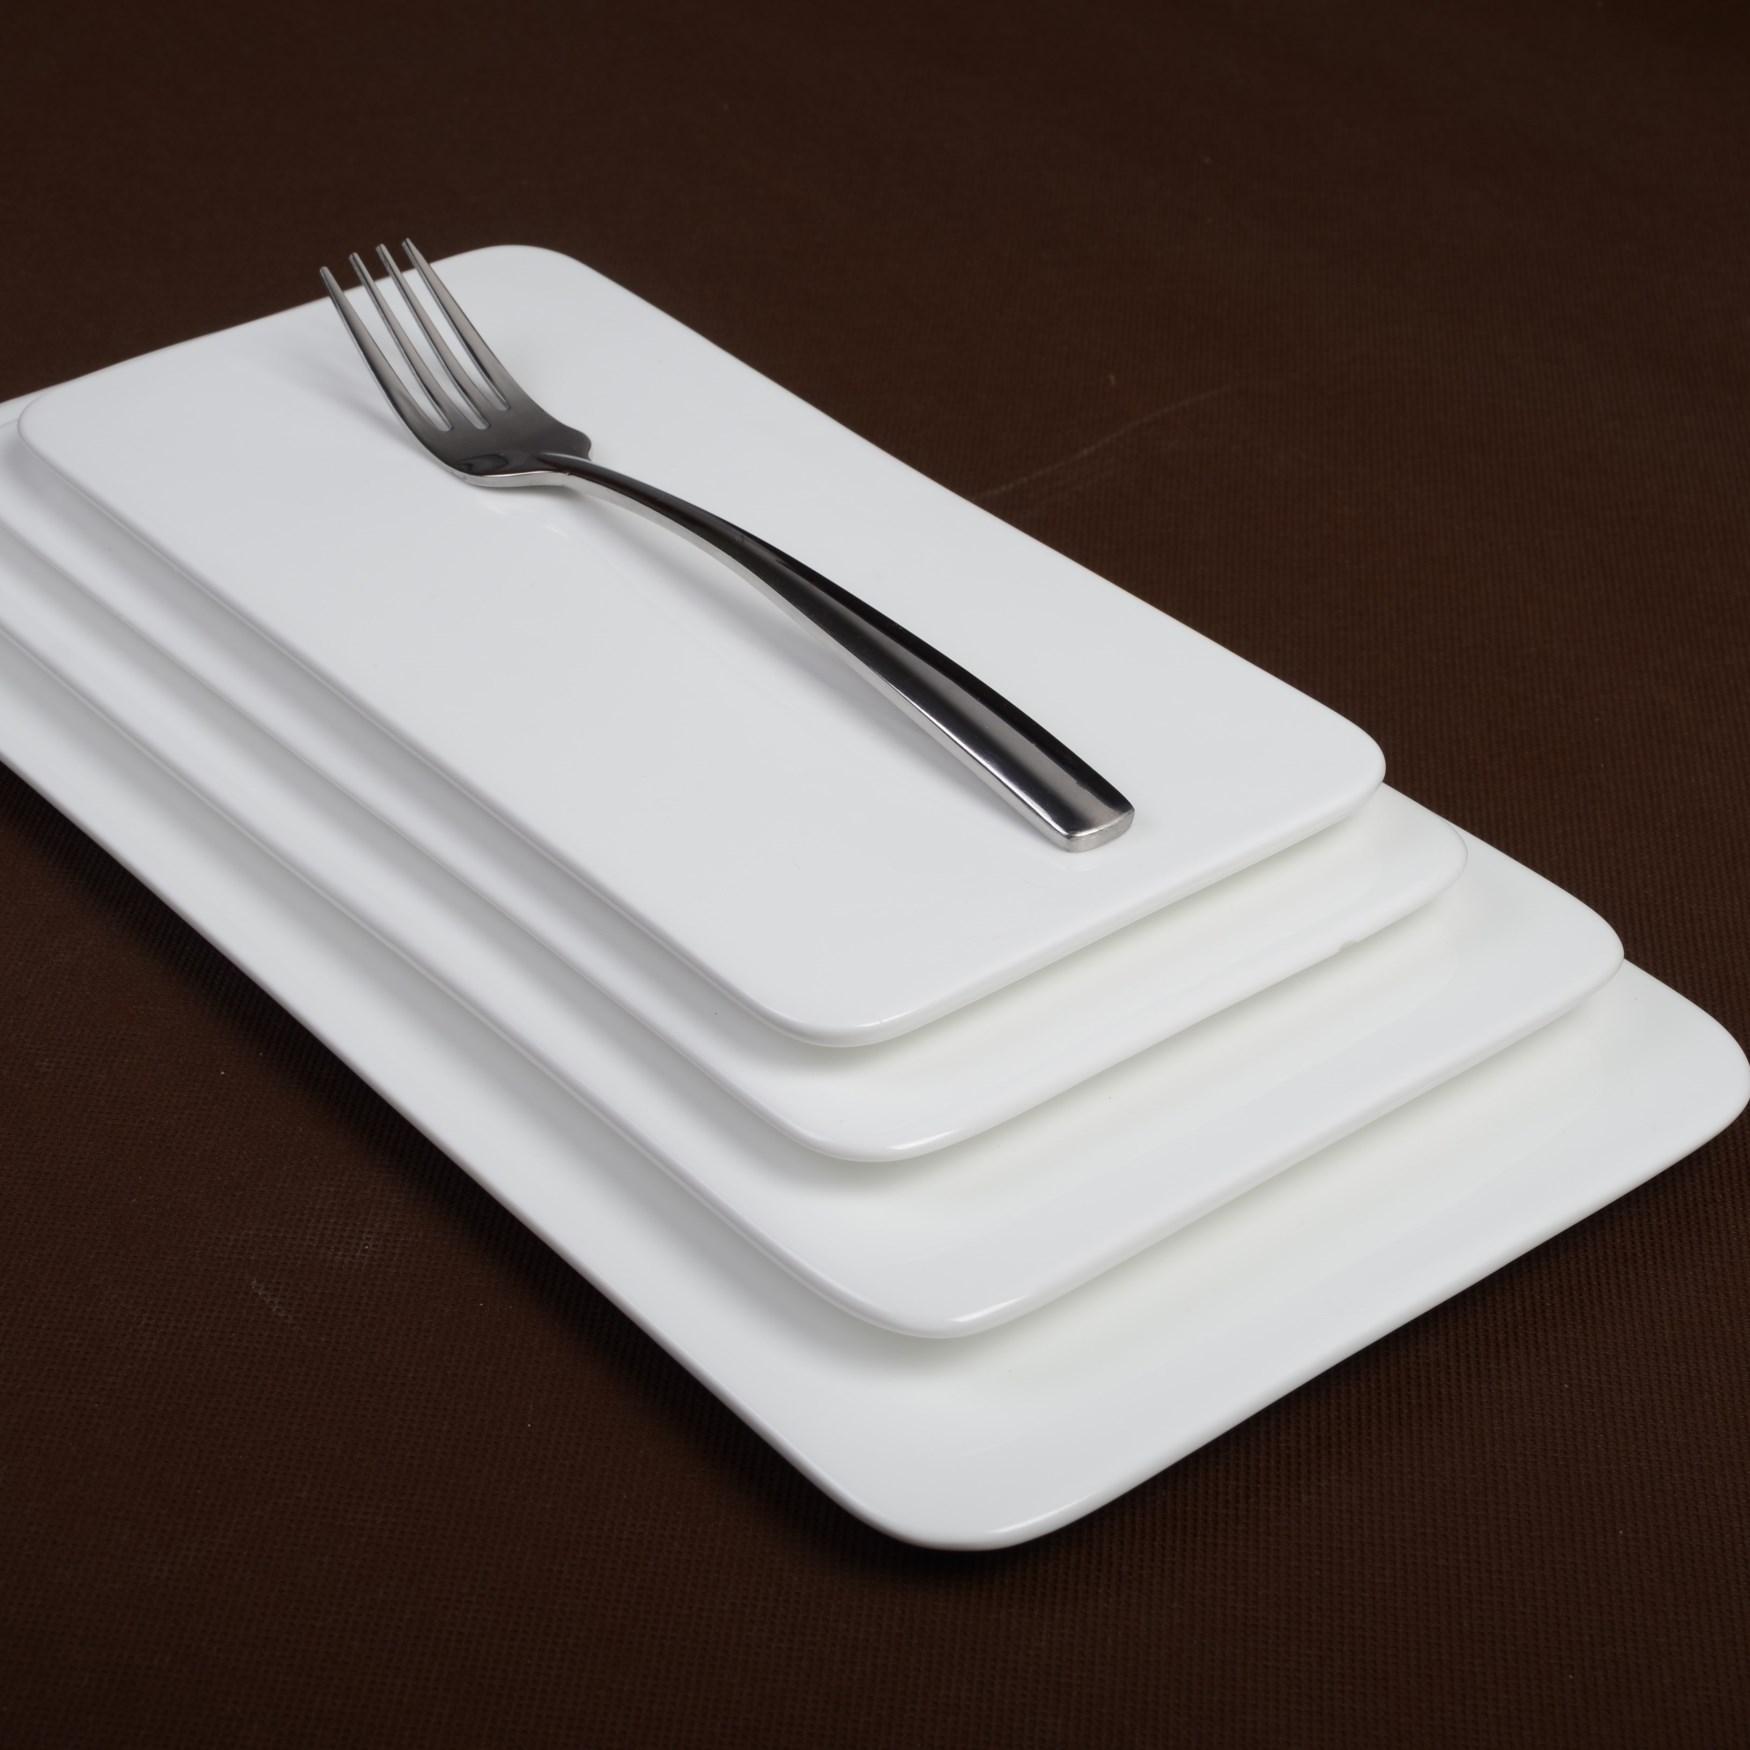 12\u0027\u0027 14\u0027\u0027 16 Inch Ceramic Porcelain White Rectangular Flat Steak Plate Dinner Pan Western Style Fruit Sushi Plates Serving Dish-in Porcelain Plates from ... & 12\u0027\u0027 14\u0027\u0027 16 Inch Ceramic Porcelain White Rectangular Flat Steak ...